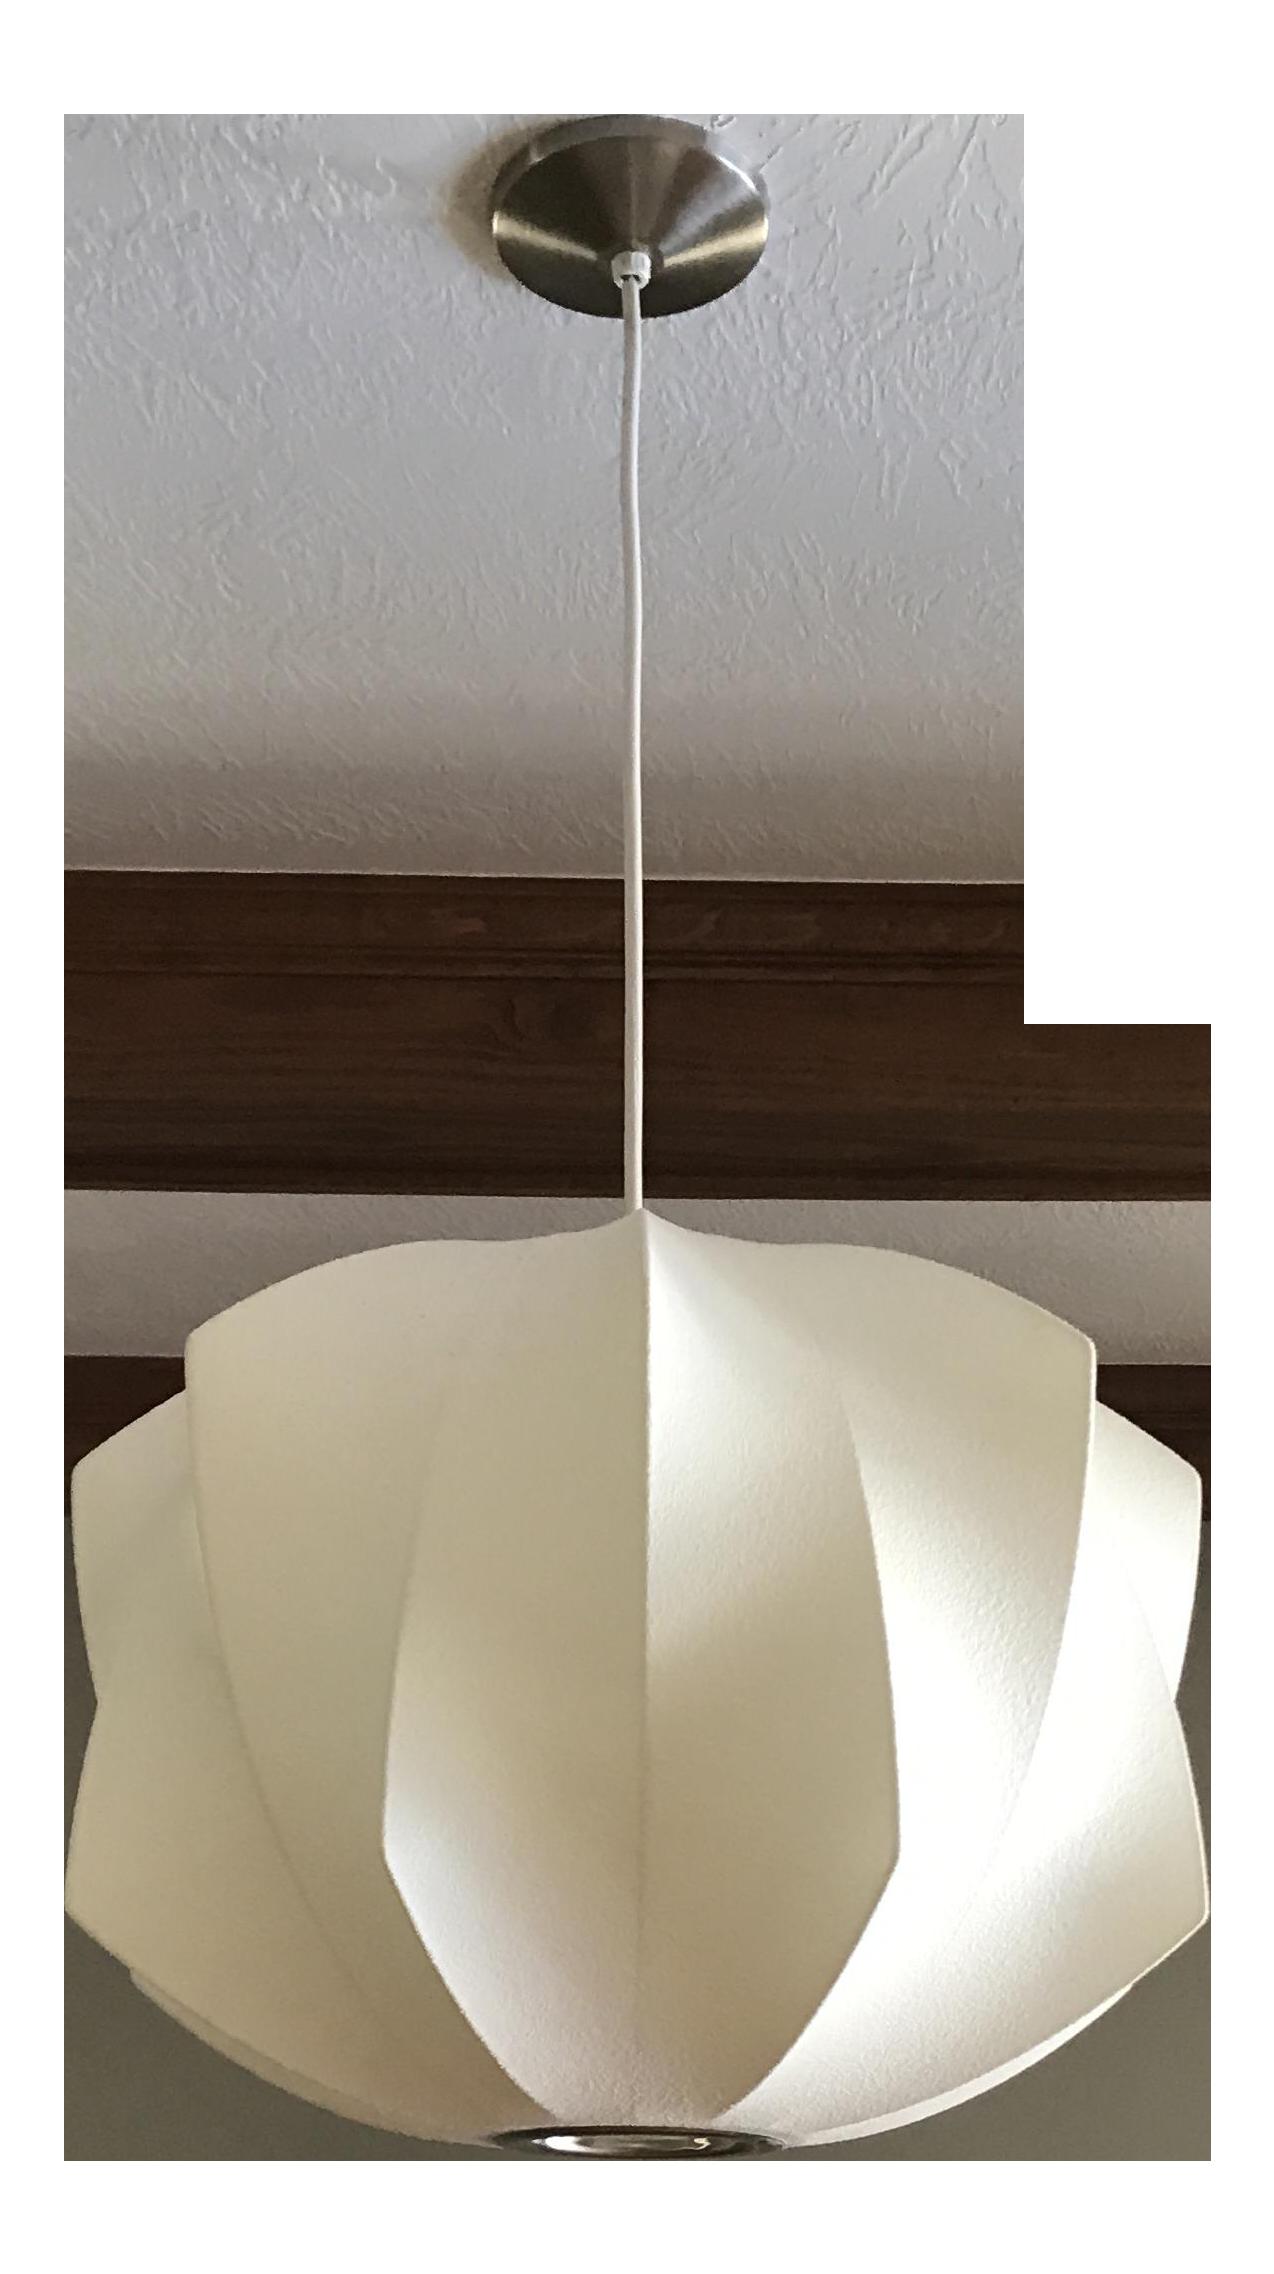 design within reach lighting. Design Within Reach Nelson Propeller Pendant Bubble Light On Chairish.com Lighting